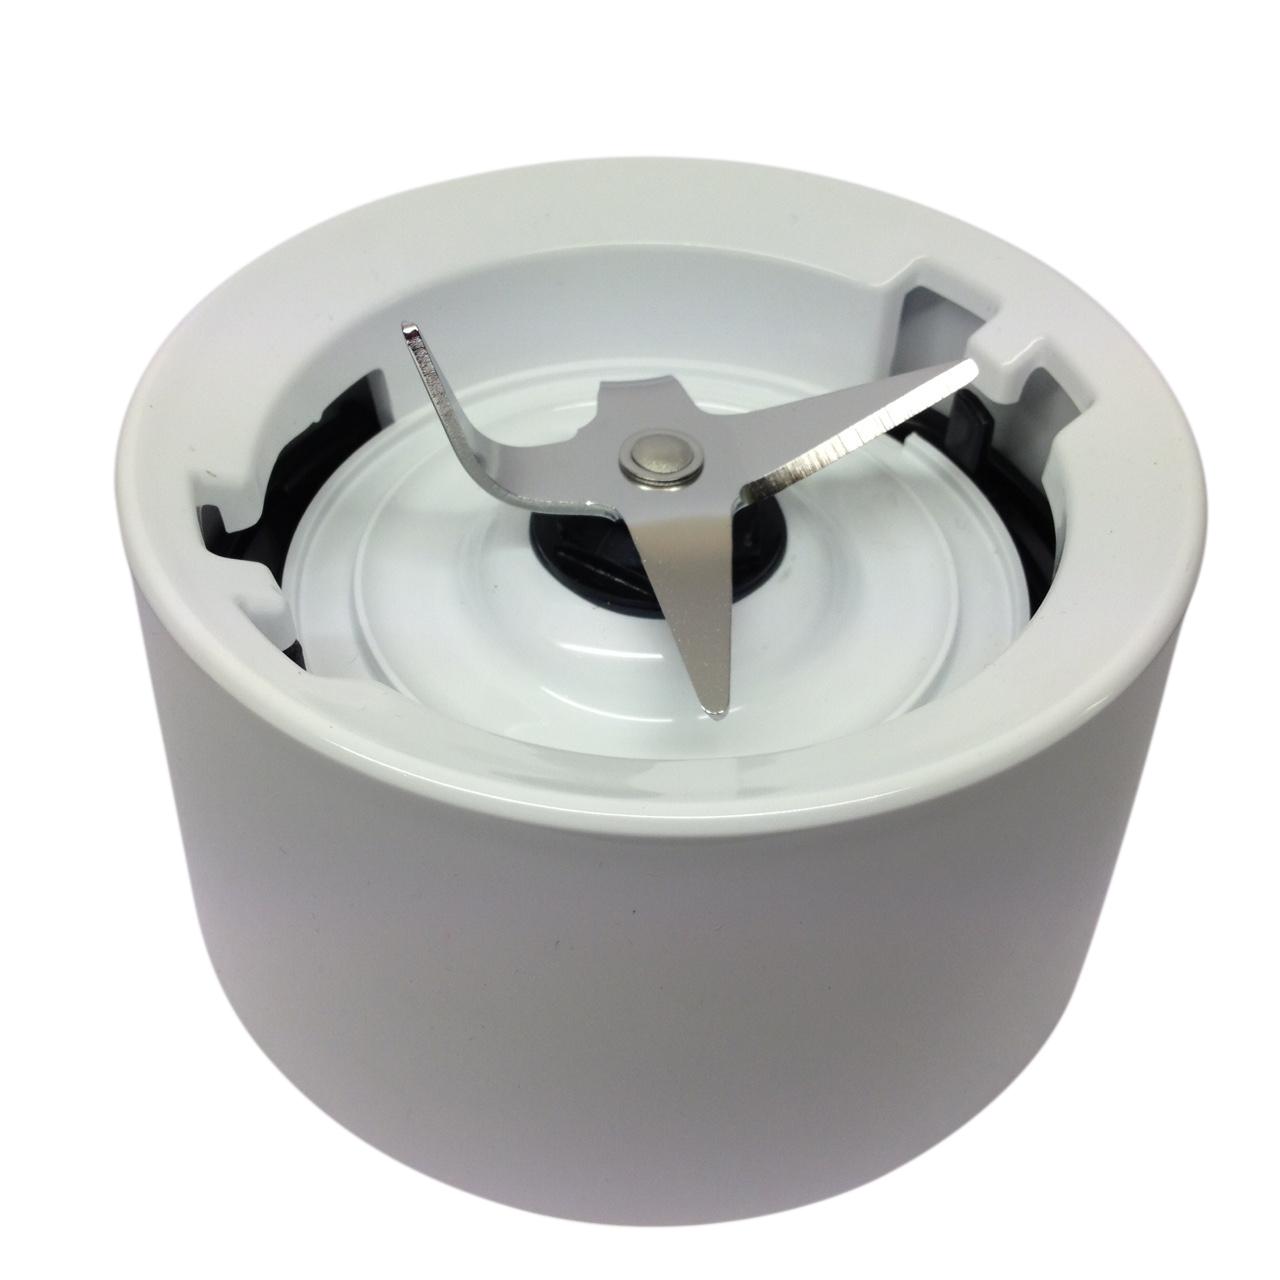 Jar Kitchen Aid Blender Model Ksbb